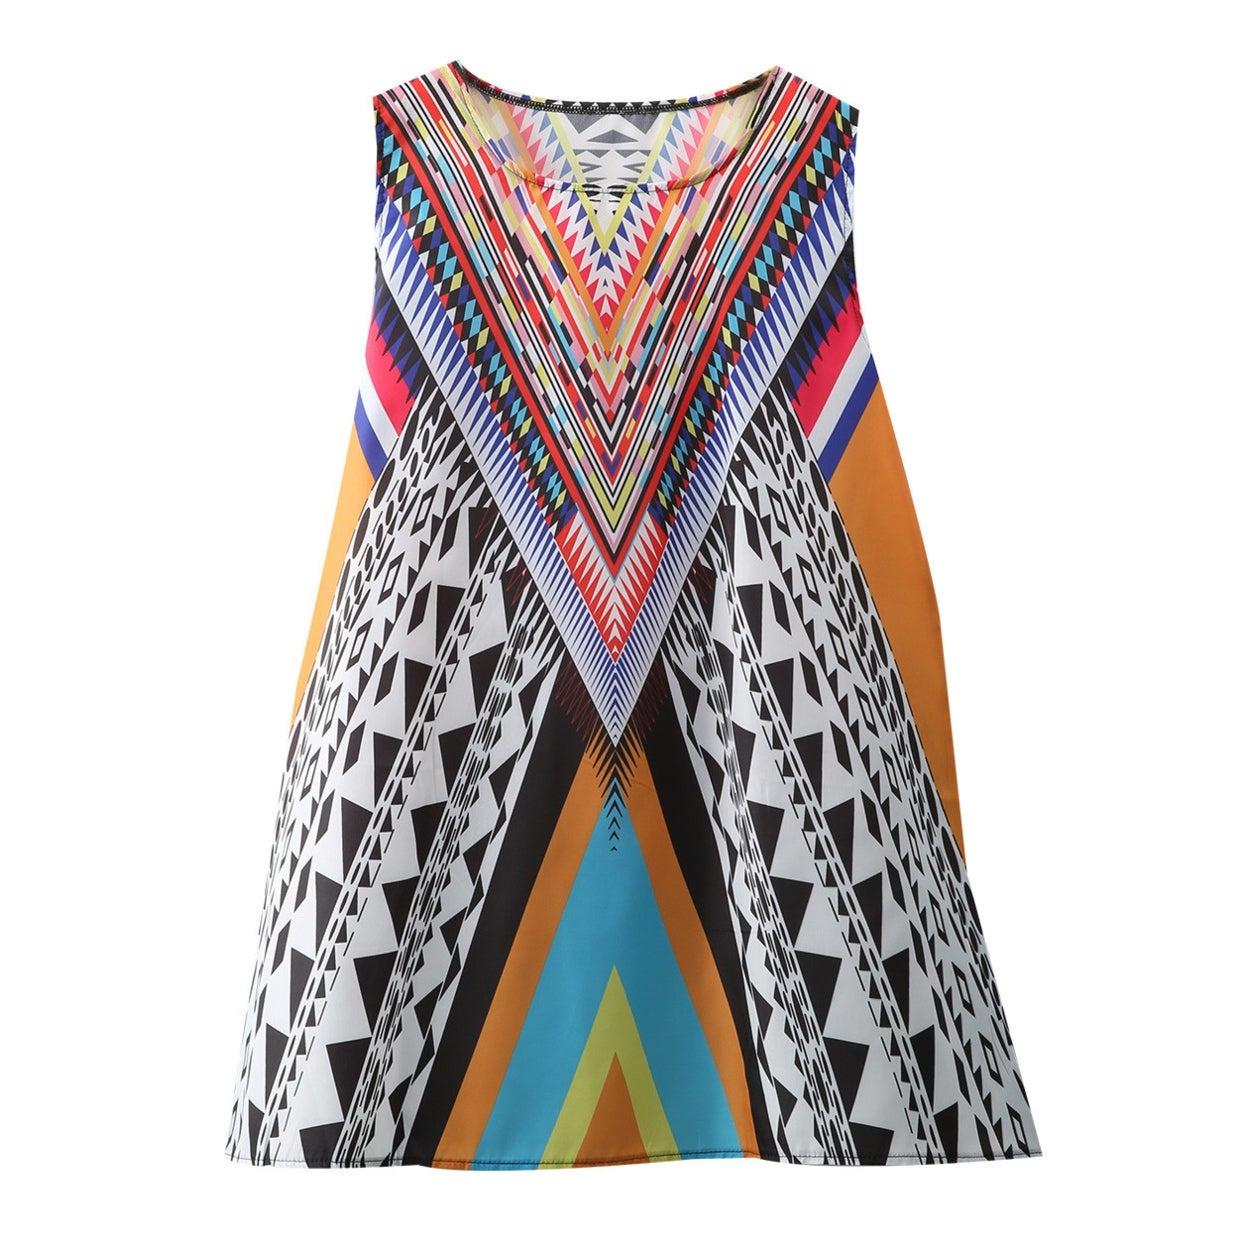 0f6d766d16 Shop 3D Vintage Print Summer Dress Bohemian Beach Dress Summer Sundresses  Women Dresses Dashiki Hippie Boho Vestidos Plus Size - On Sale - Free  Shipping On ...